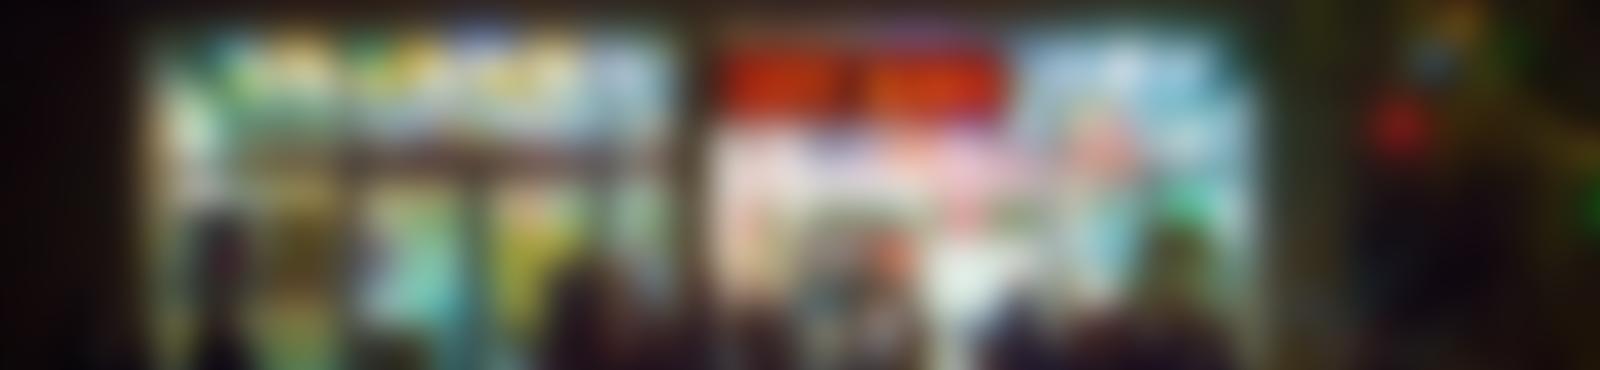 Blurred 1028ad01 f577 4816 a9a4 04c2d74abf0e